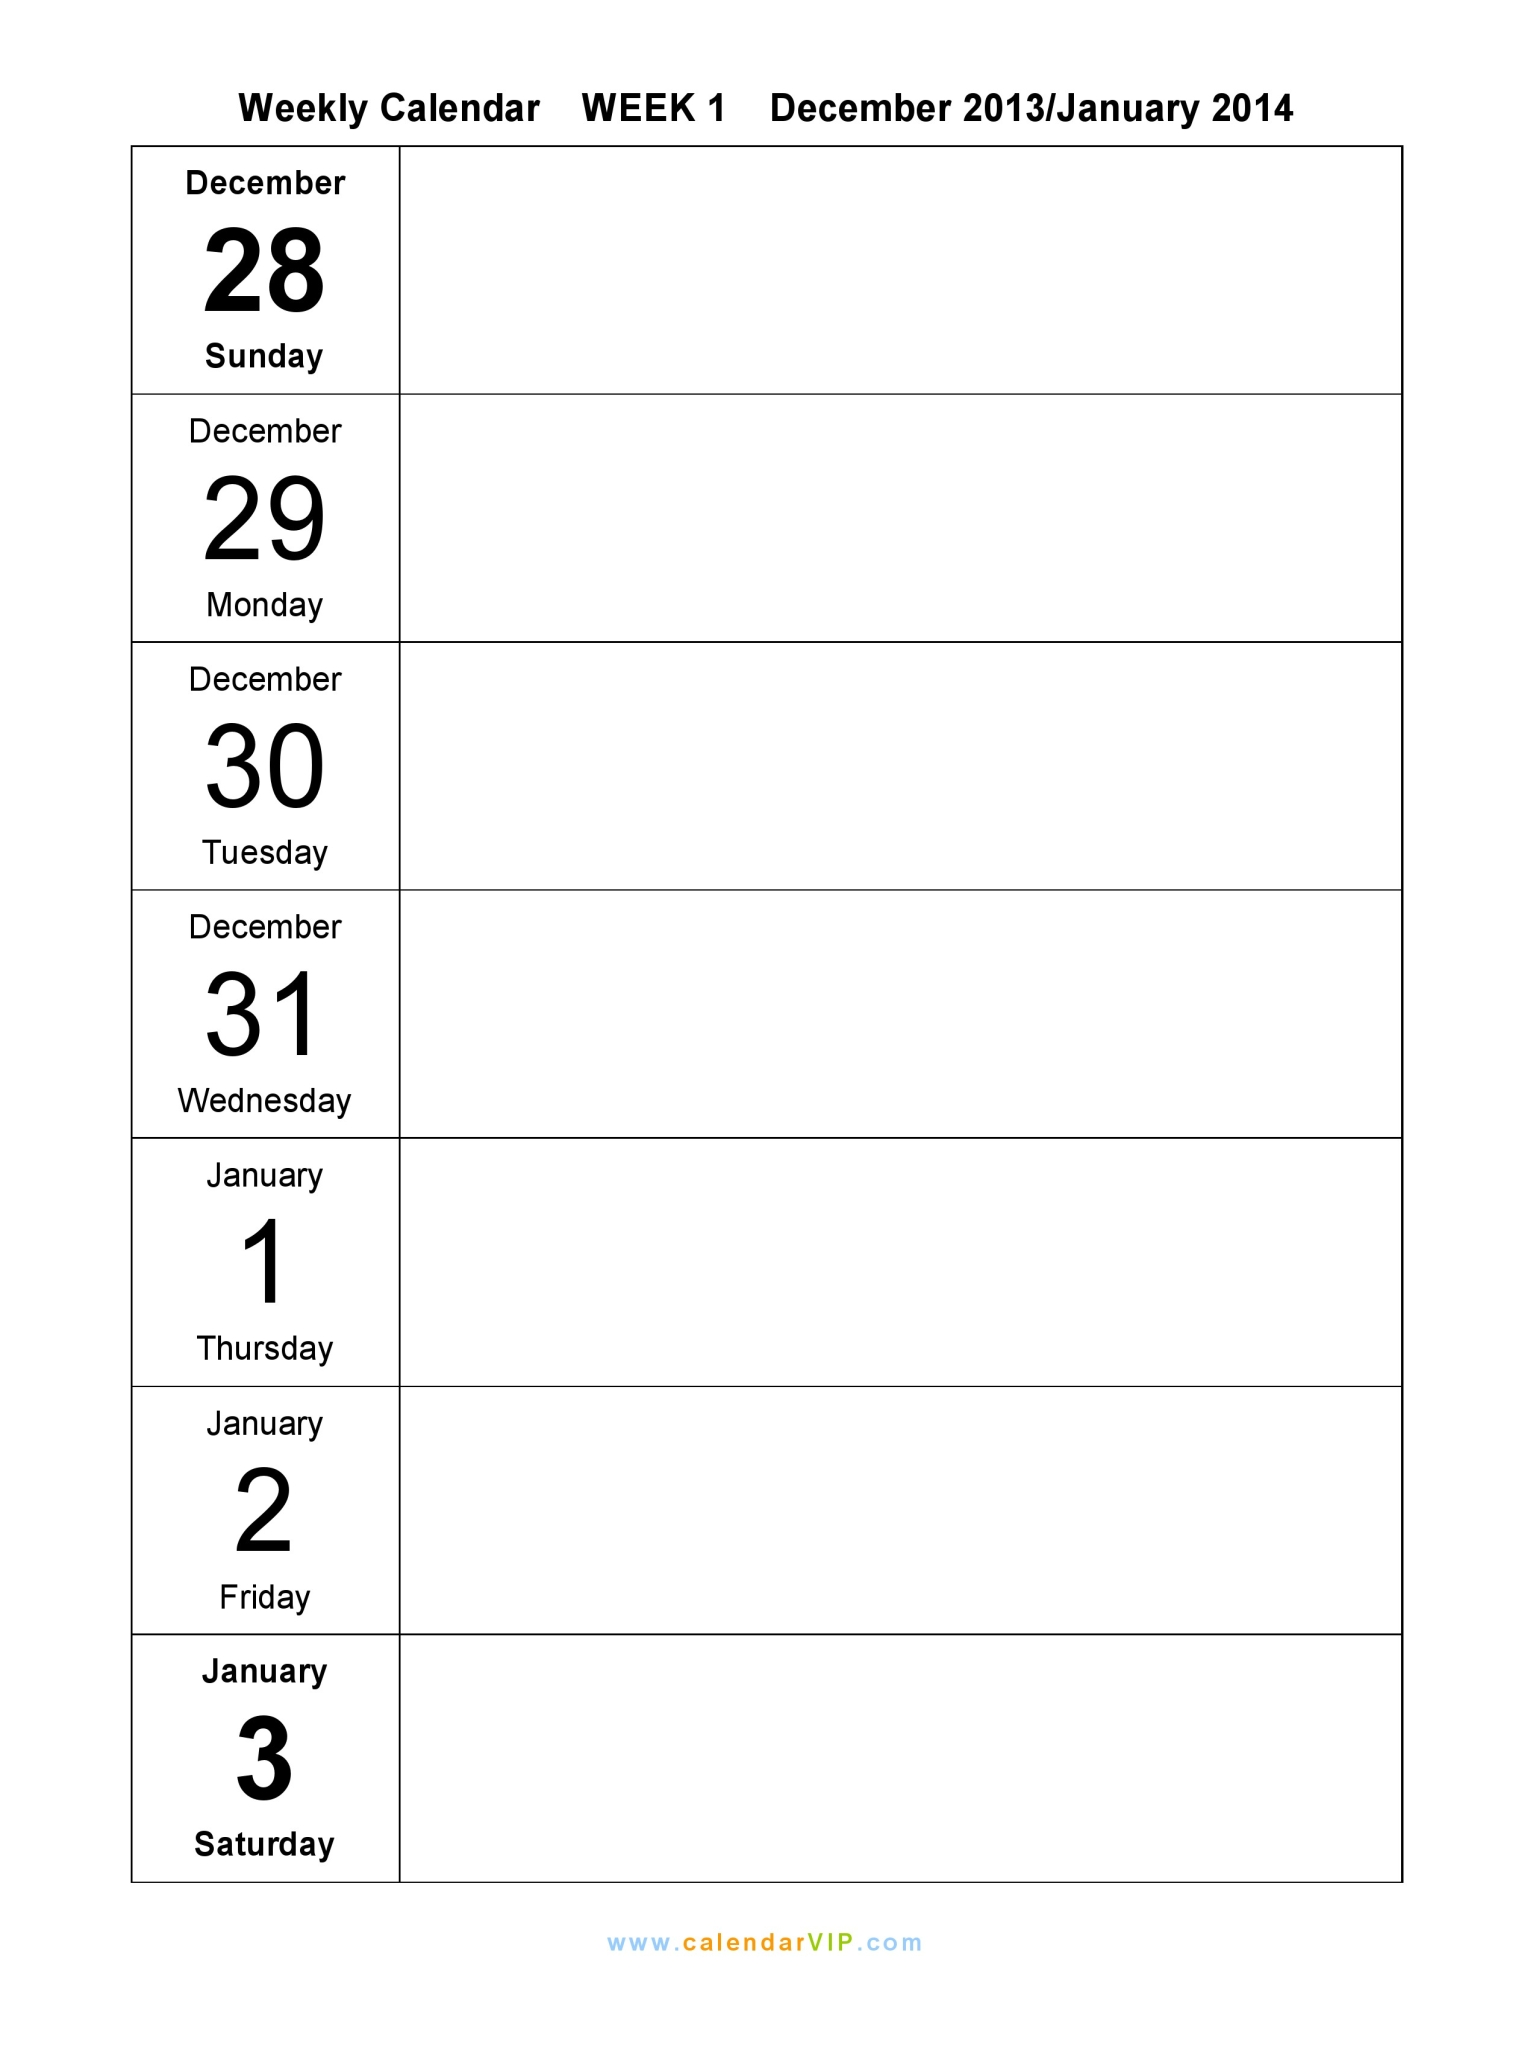 7 Images of Printable 2015 Weekly Calendar Template.pdf